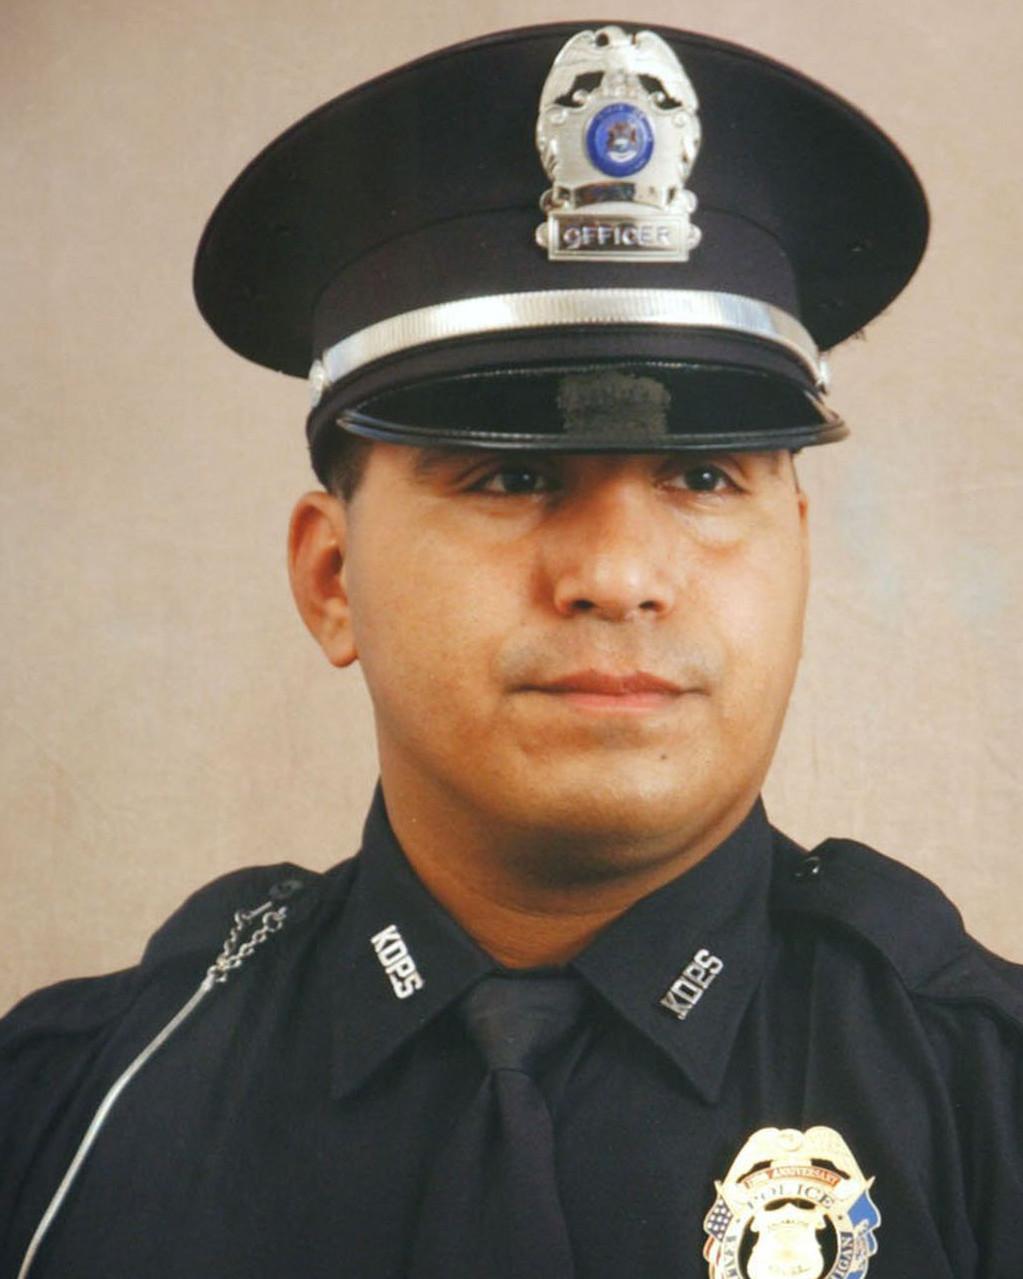 Public Safety Officer Eric Emiliano Zapata   Kalamazoo Department of Public Safety, Michigan